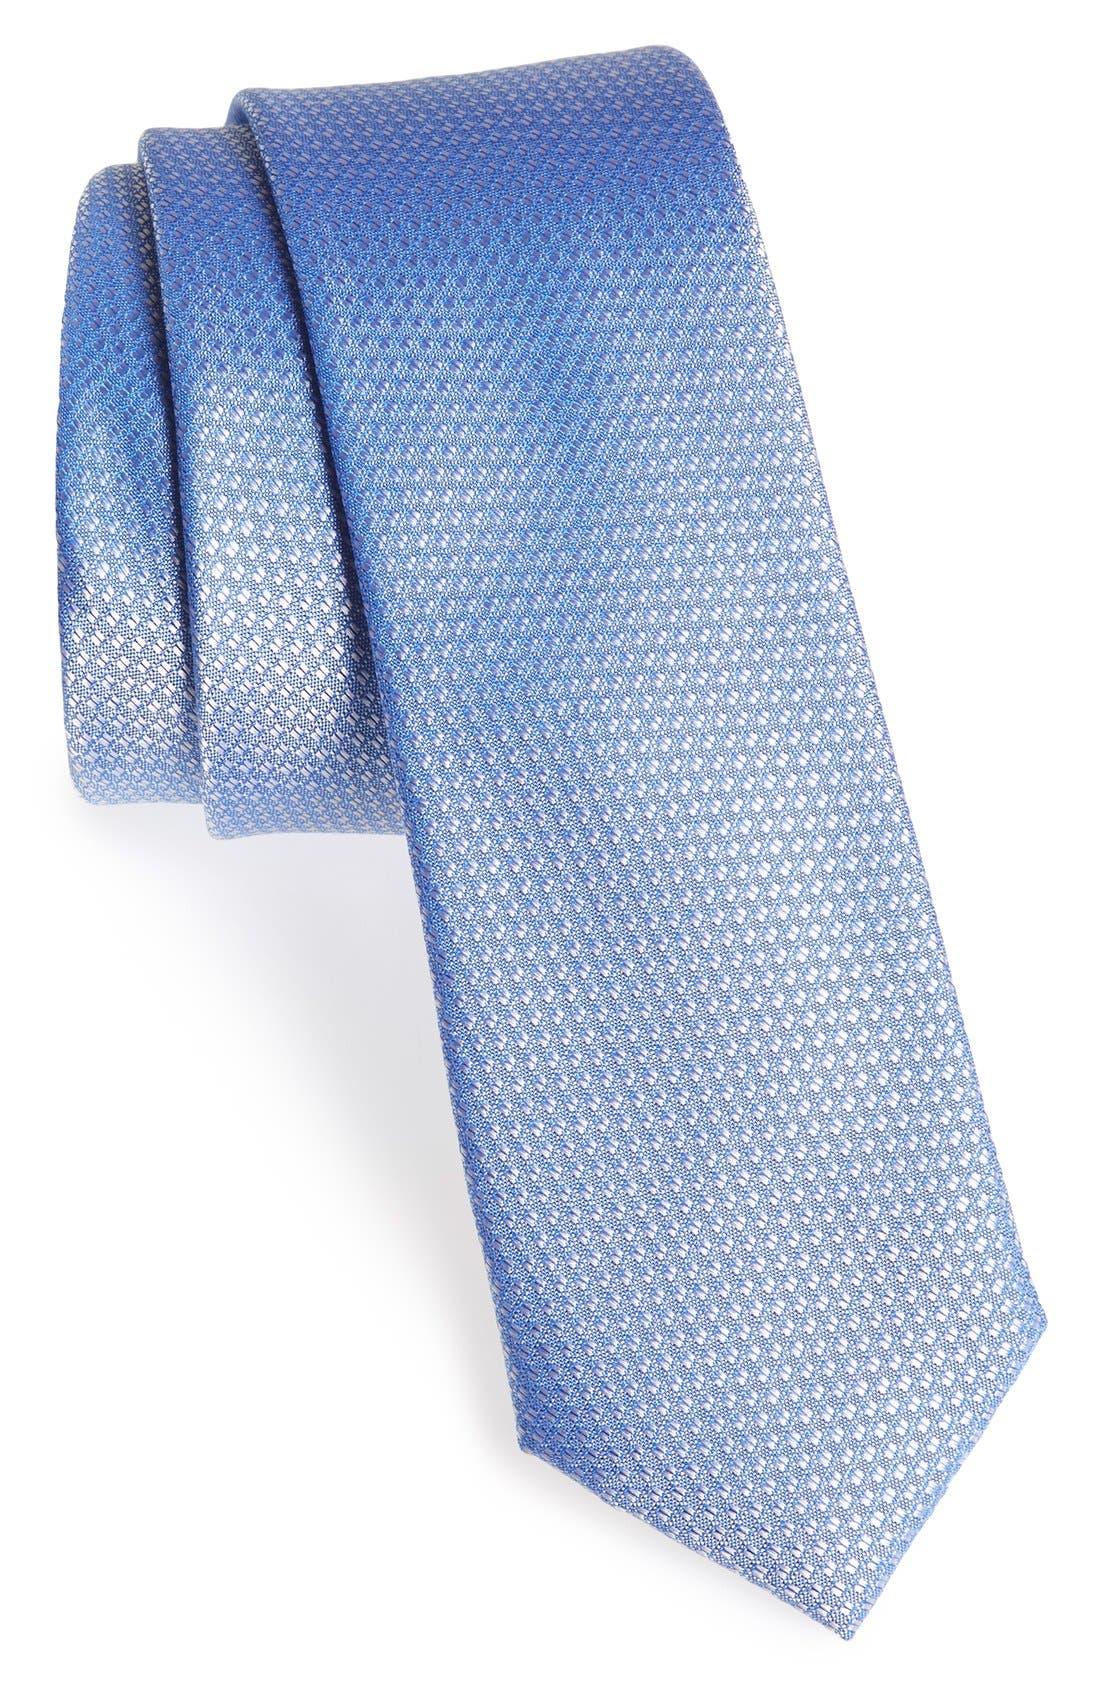 Seattle Textured Silk Tie,                             Main thumbnail 12, color,